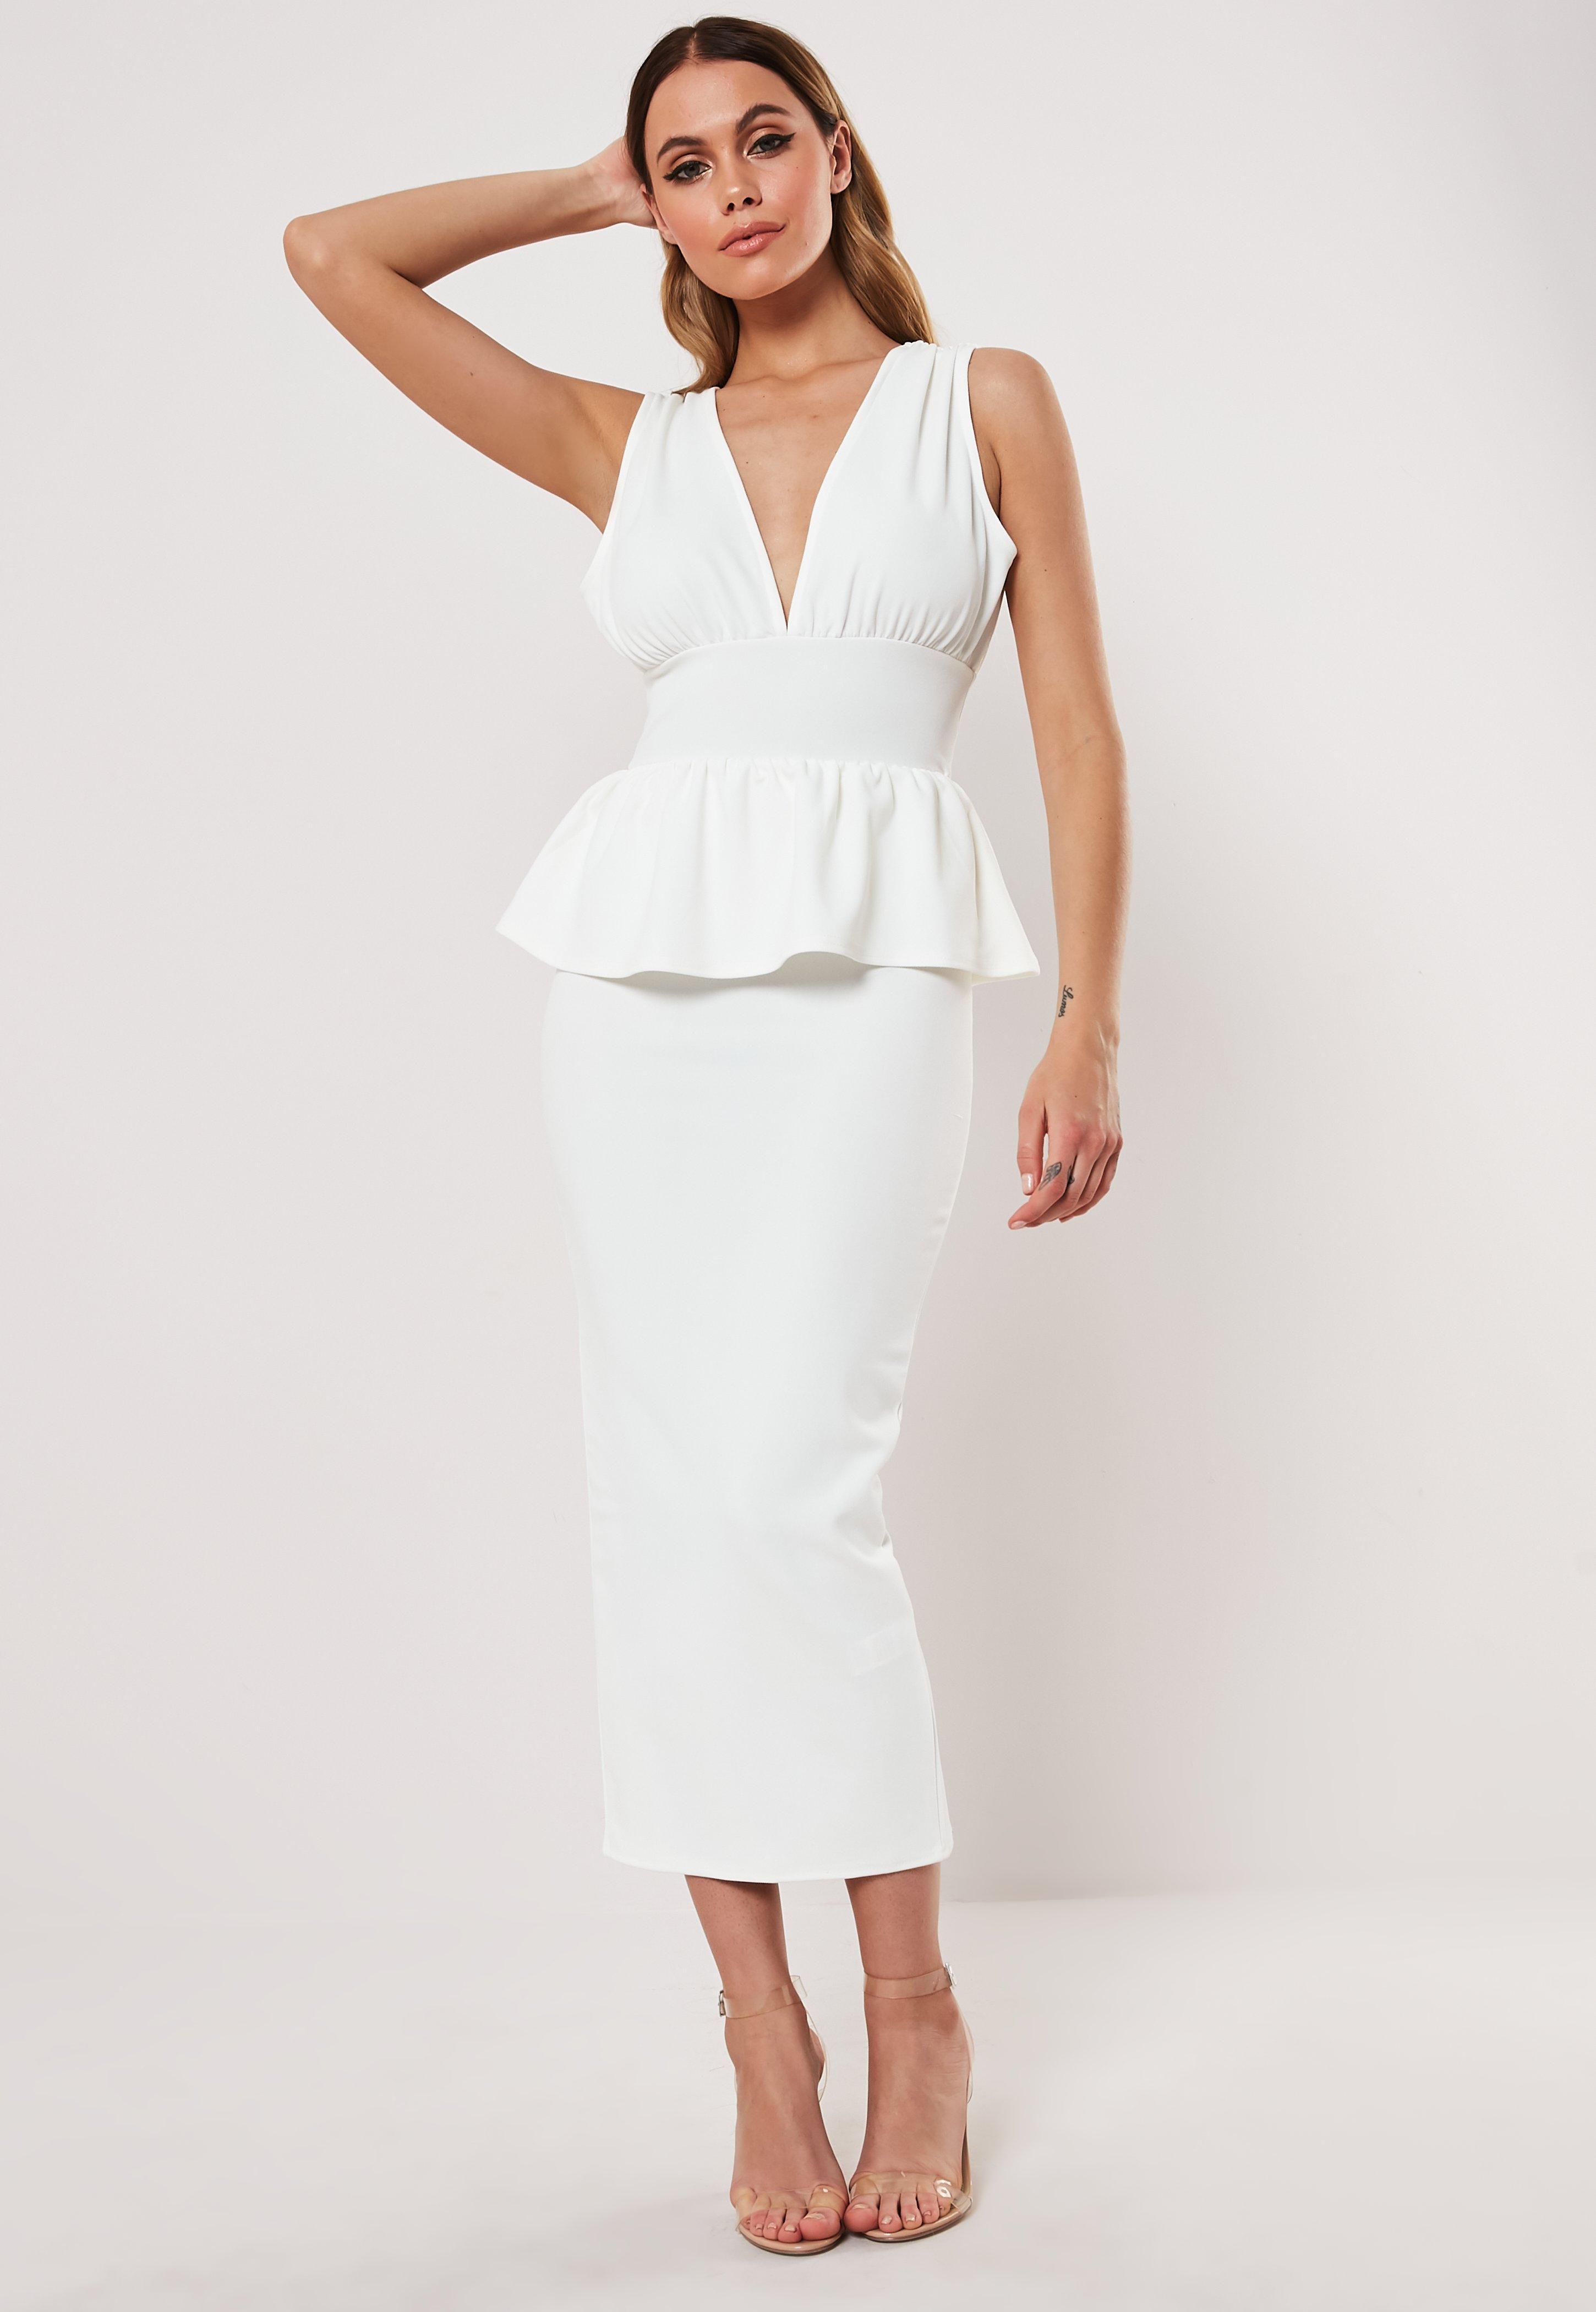 5309c067d Robe blanche mi-longue péplum